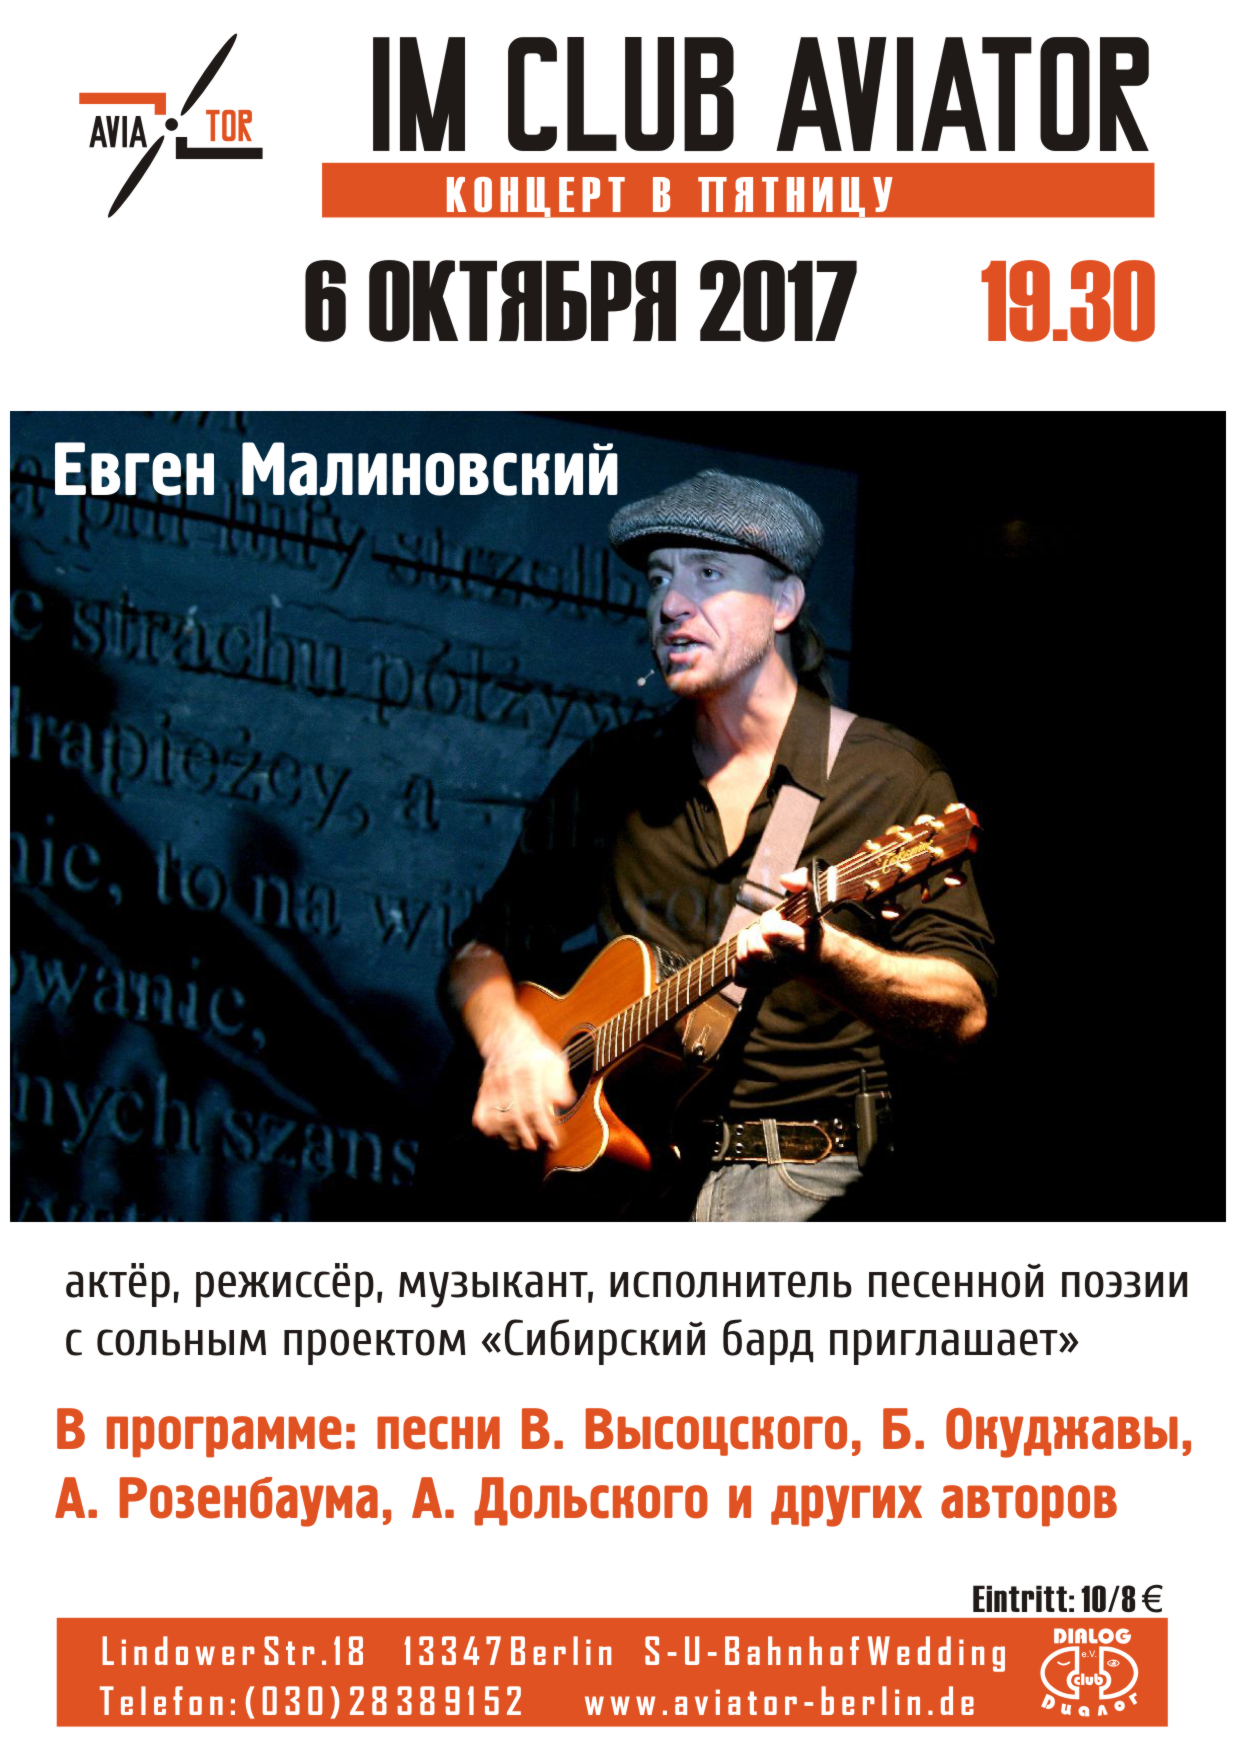 6malinovski plakat ru web